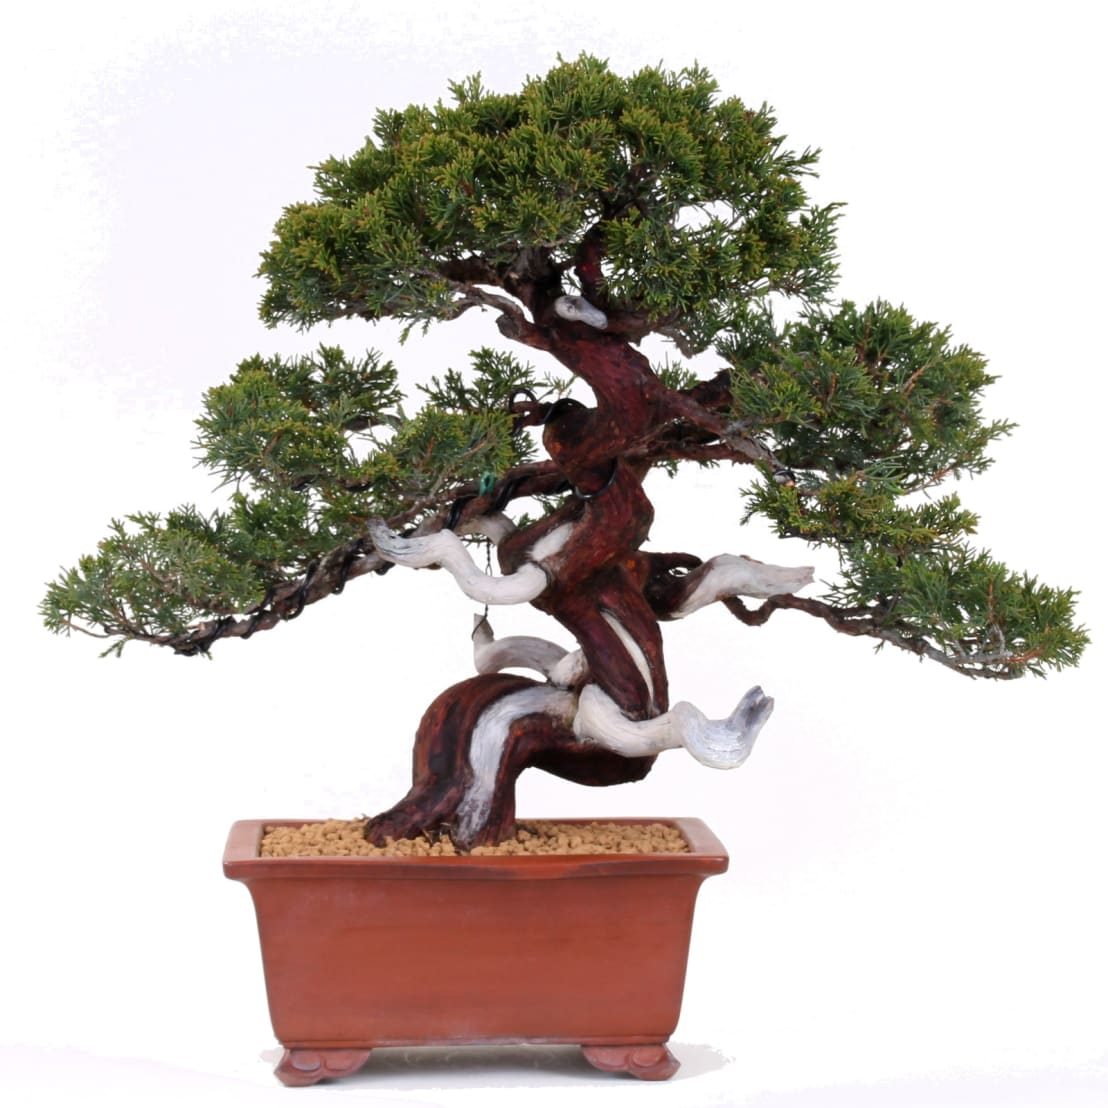 bonsai nadelb ume von bonsai shopping homify. Black Bedroom Furniture Sets. Home Design Ideas